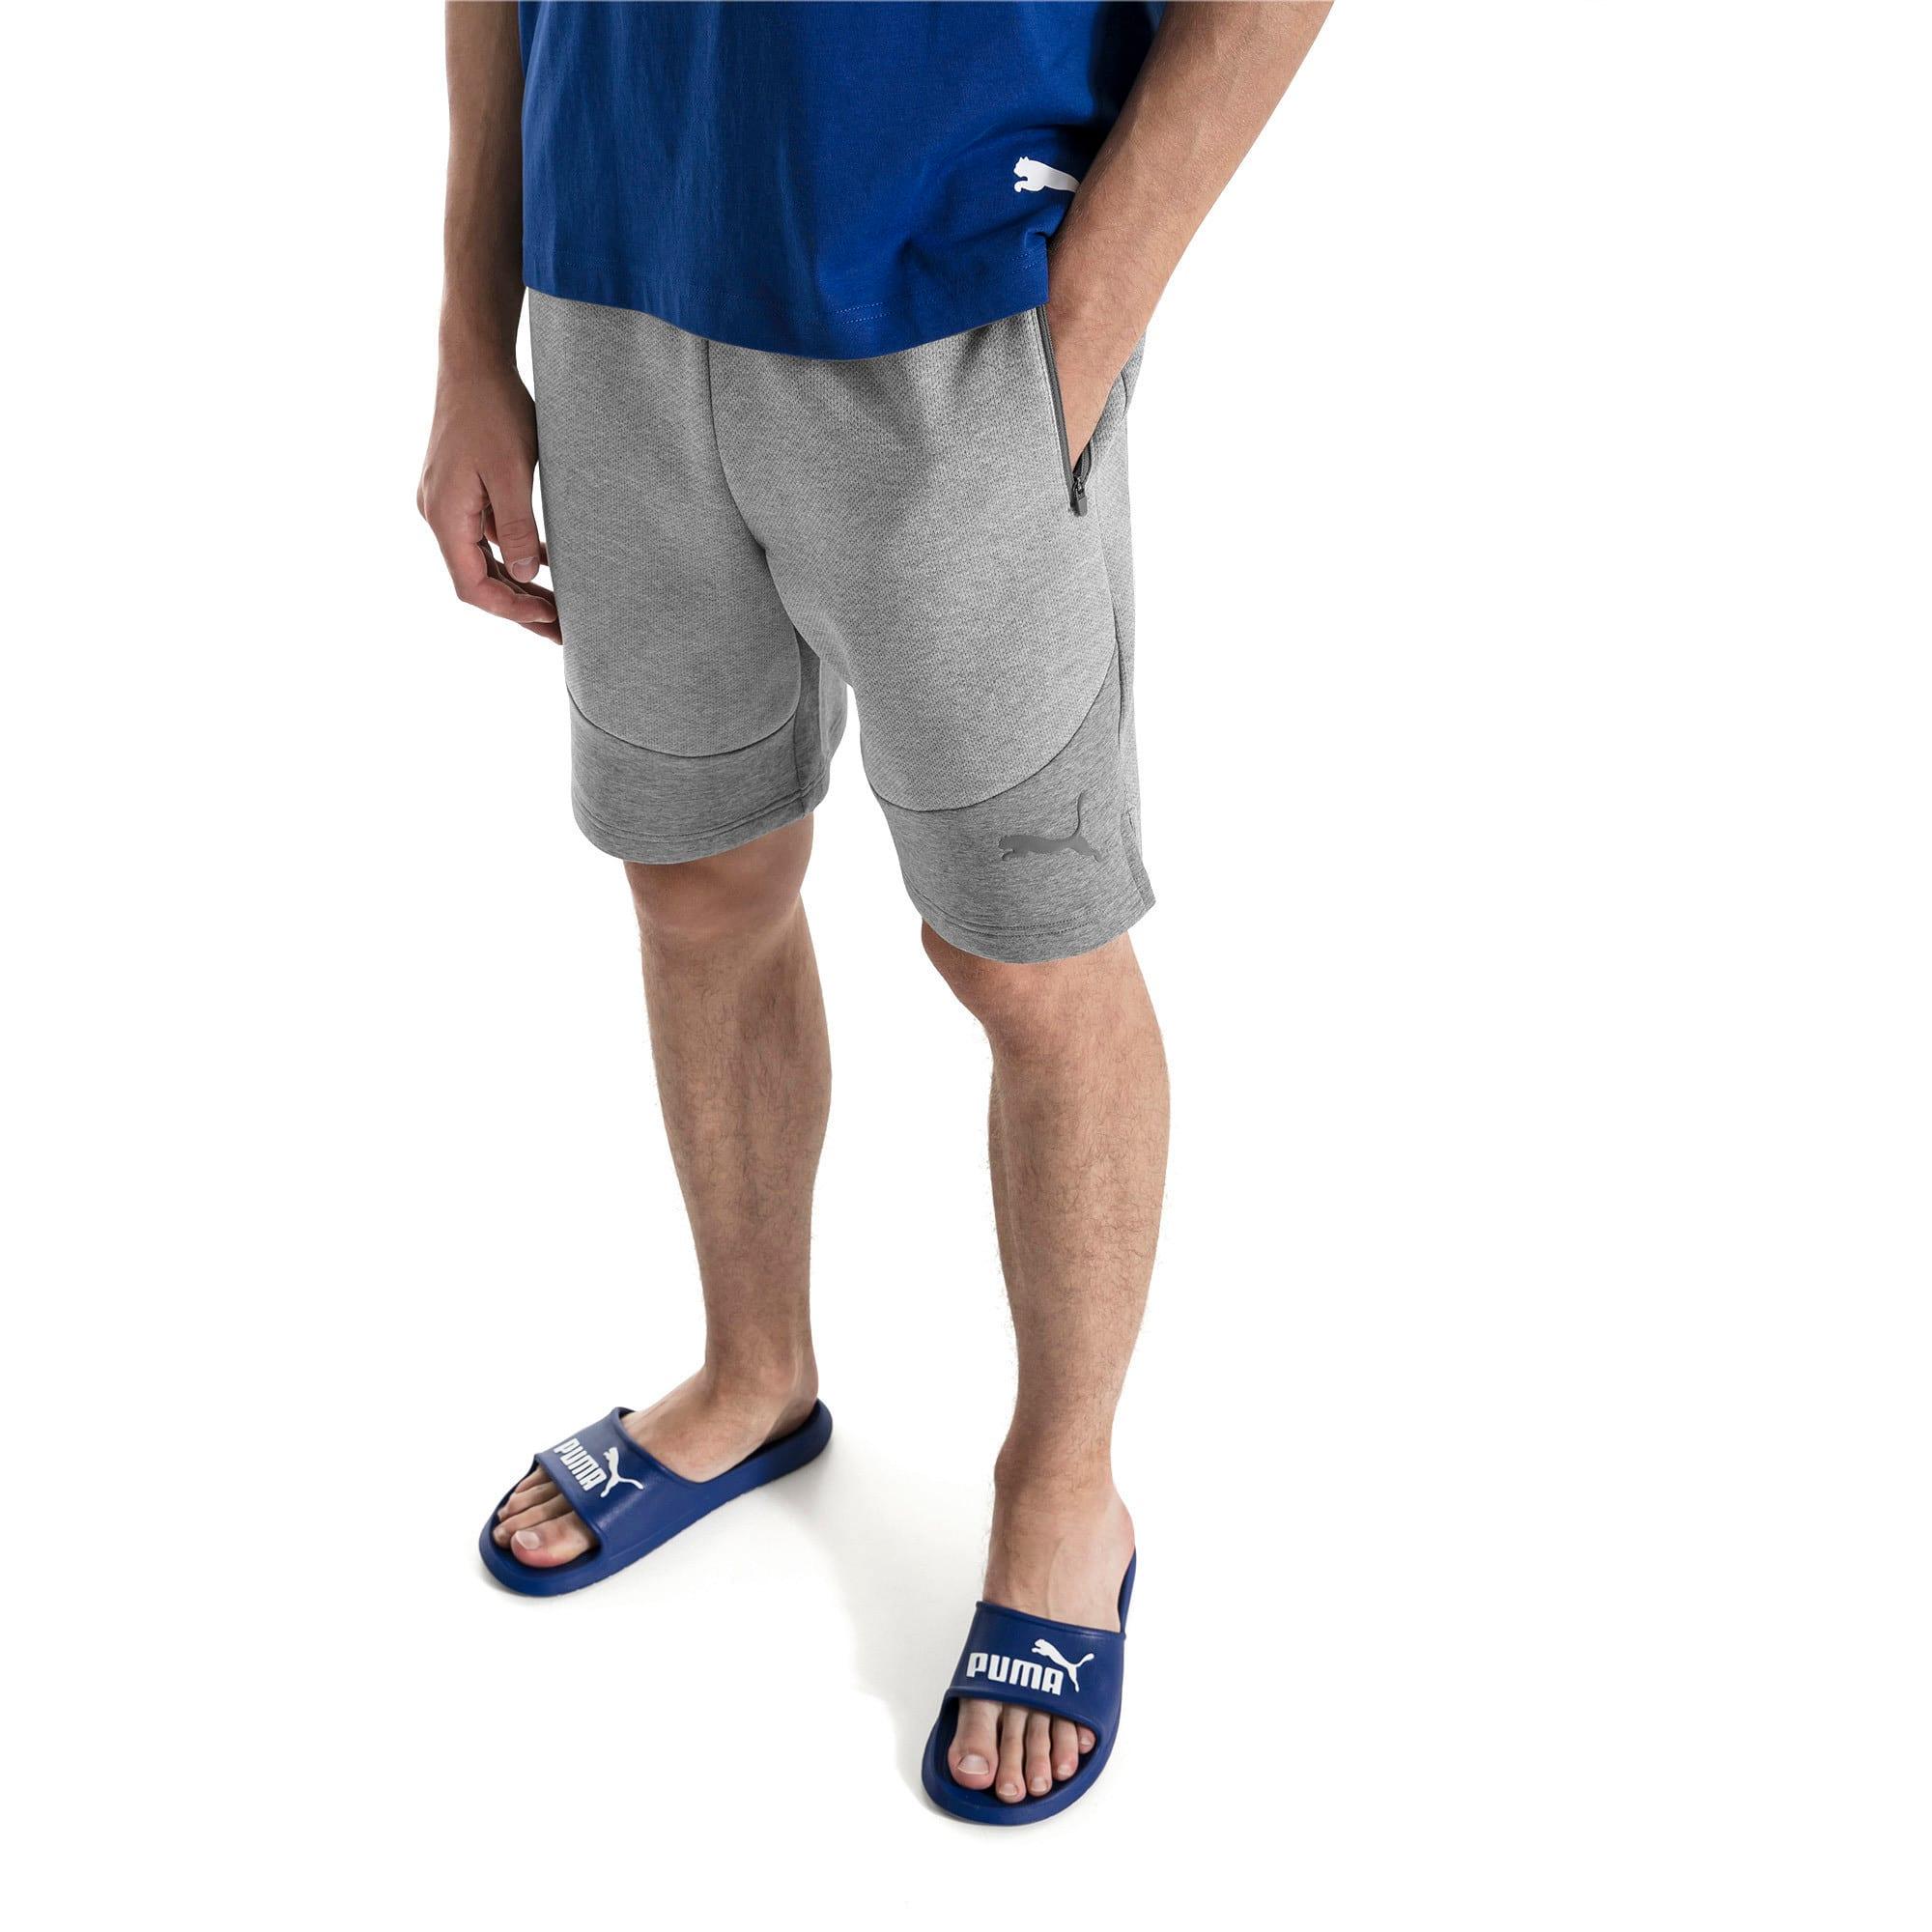 "Thumbnail 1 of Evostripe Move 8"" Men's Shorts, Medium Gray Heather, medium"